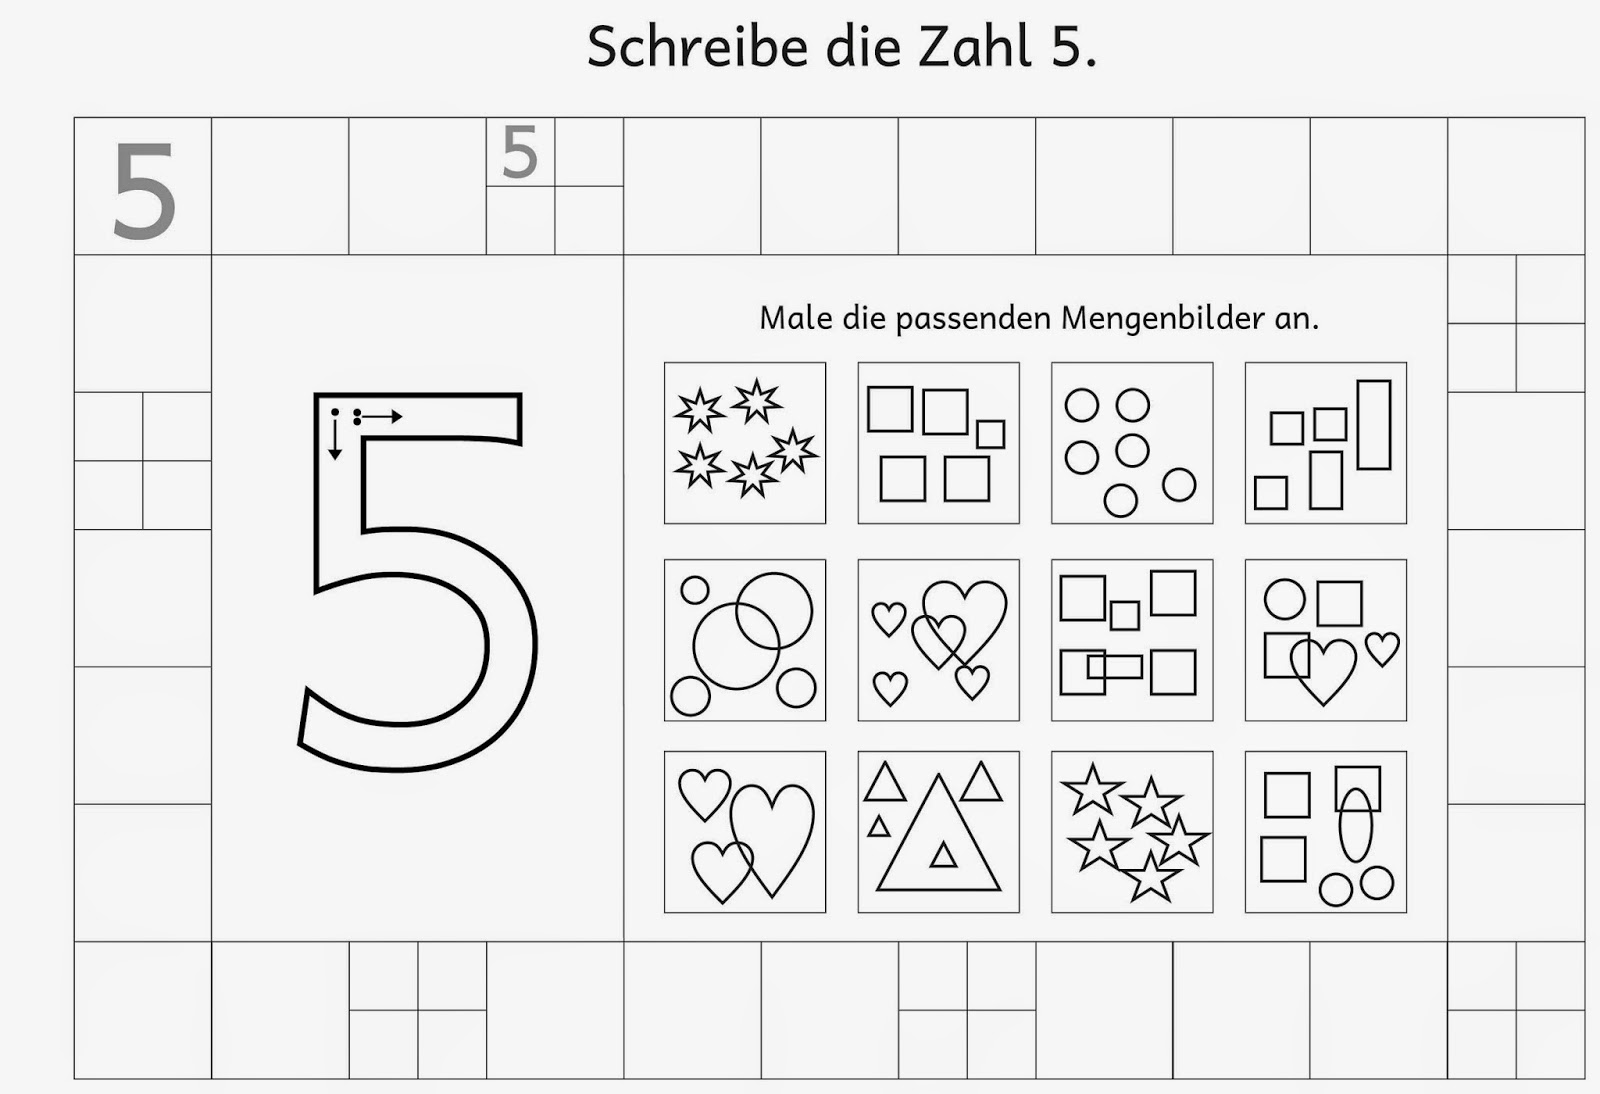 Fein Zahlen 1 5 Arbeitsblatt Fotos - Arbeitsblatt Schule ...